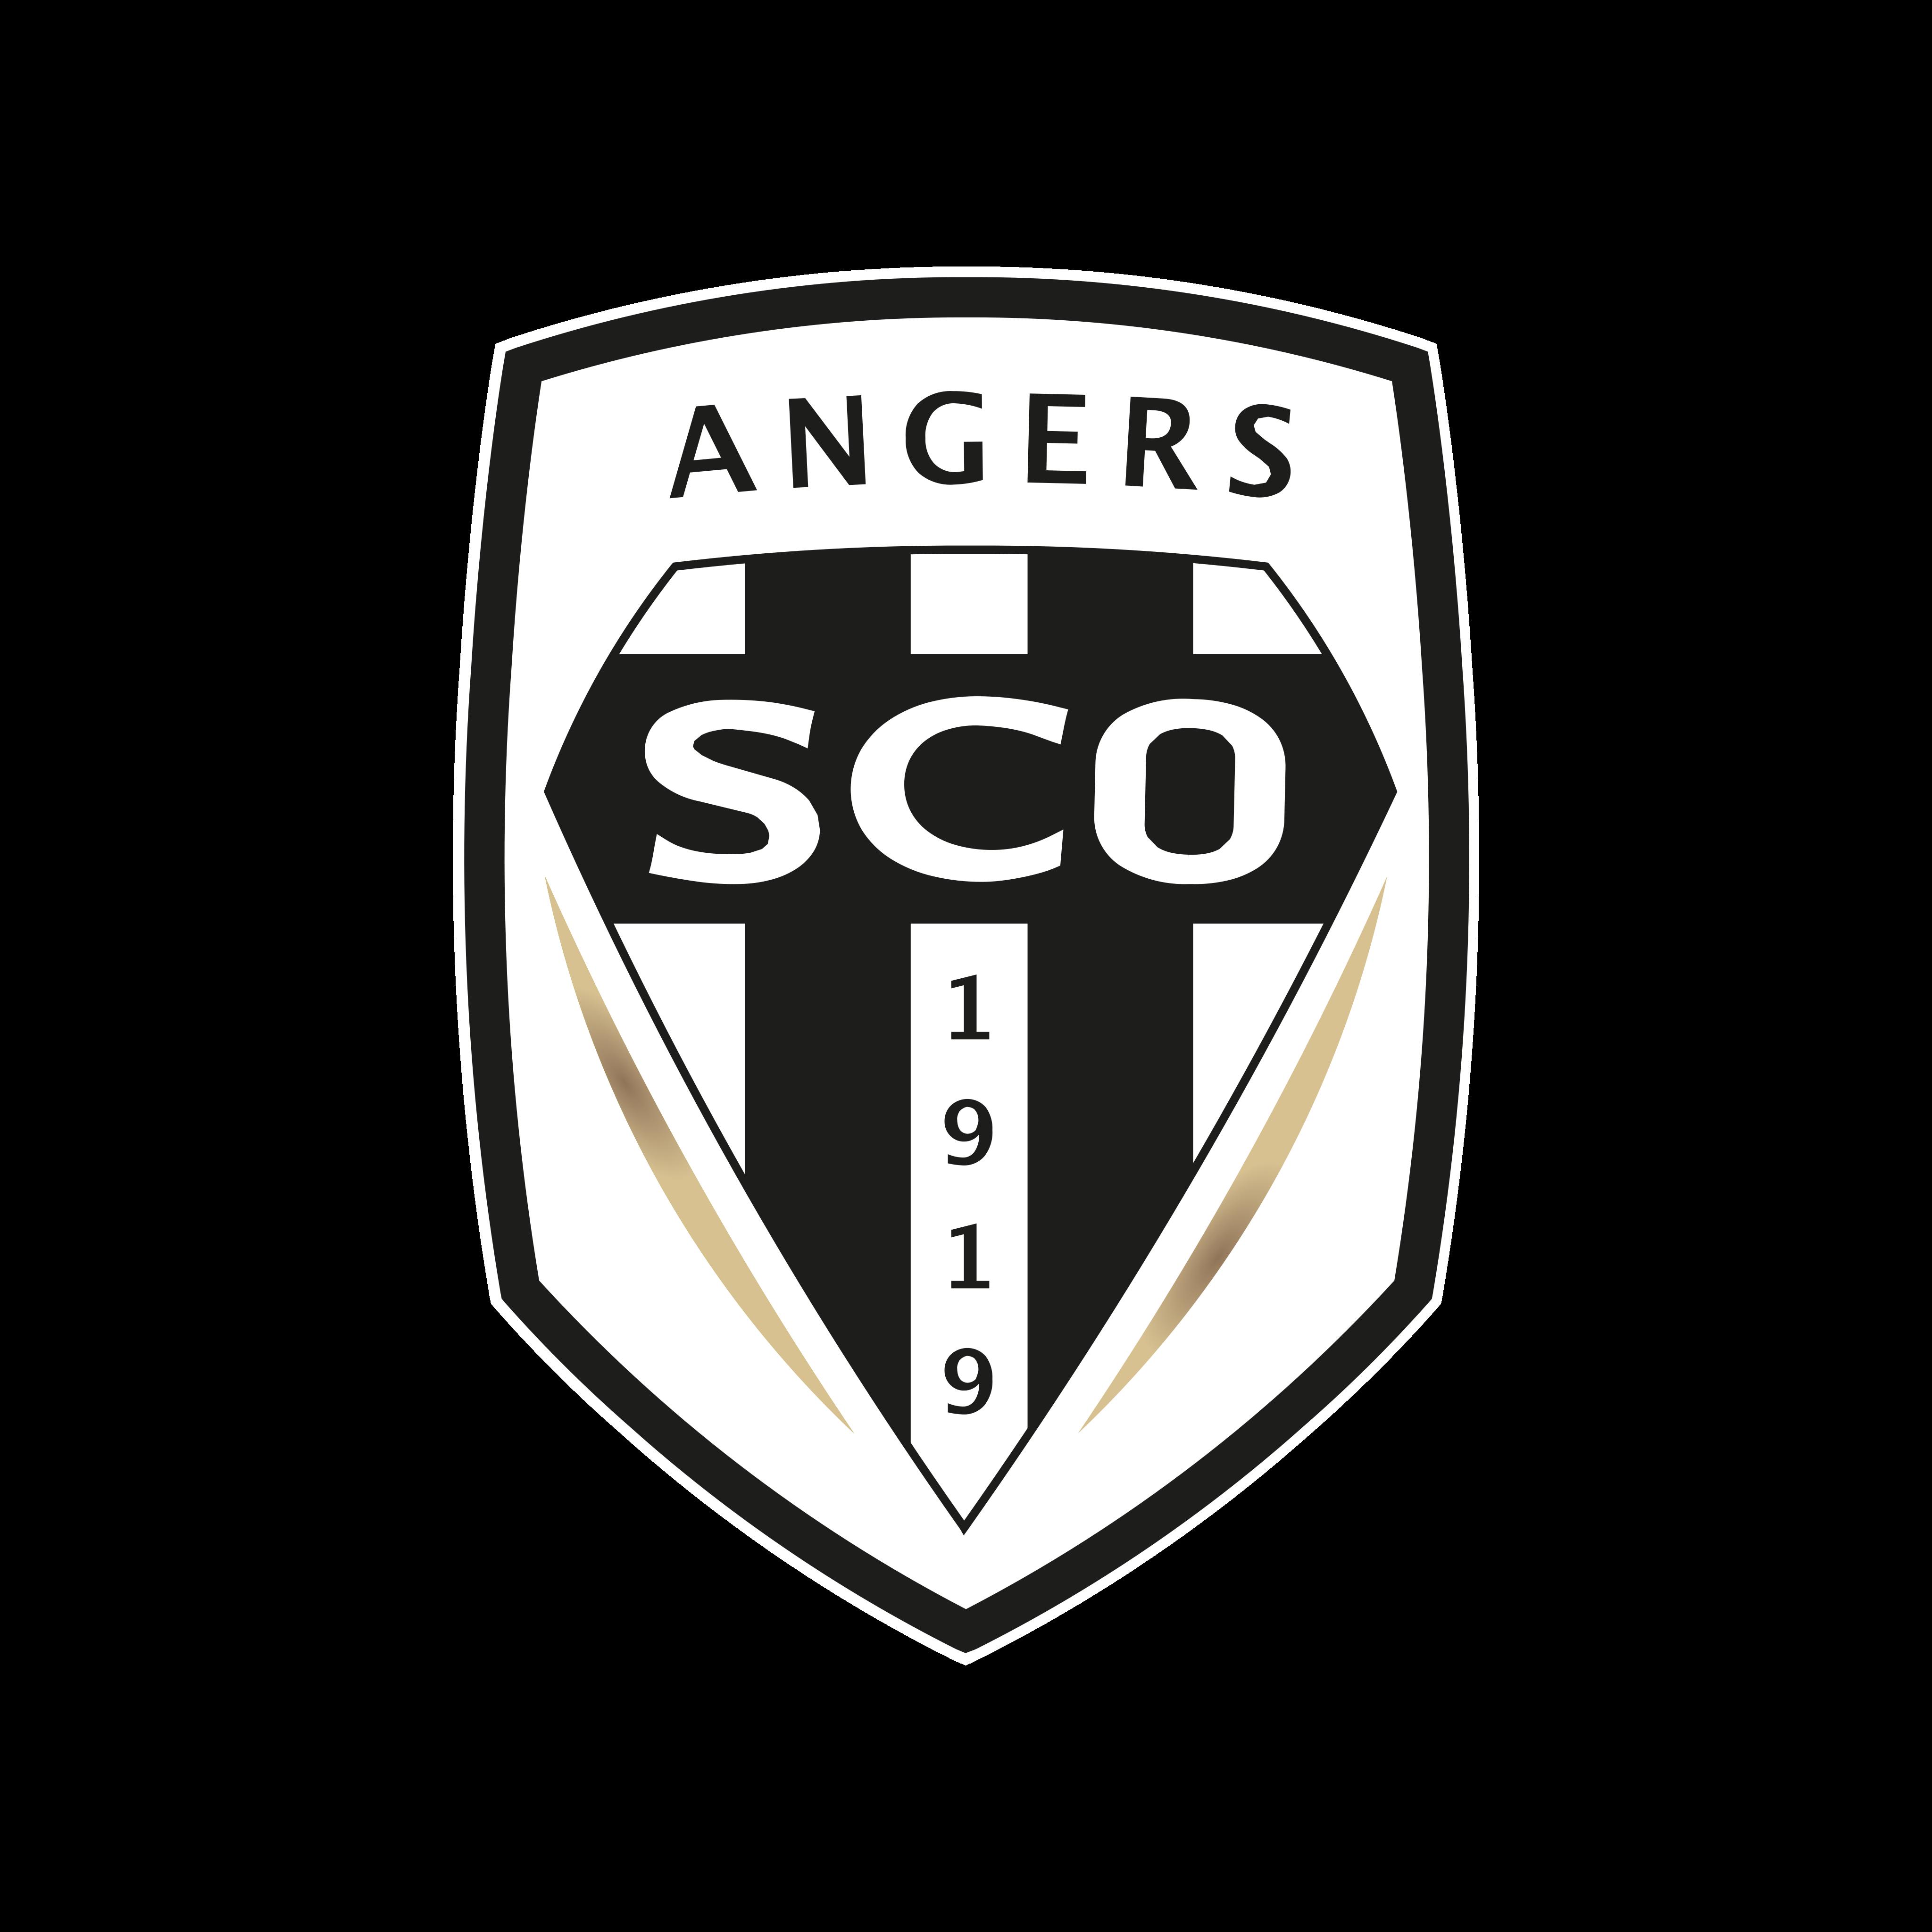 angers sco logo 0 - Angers SCO Logo